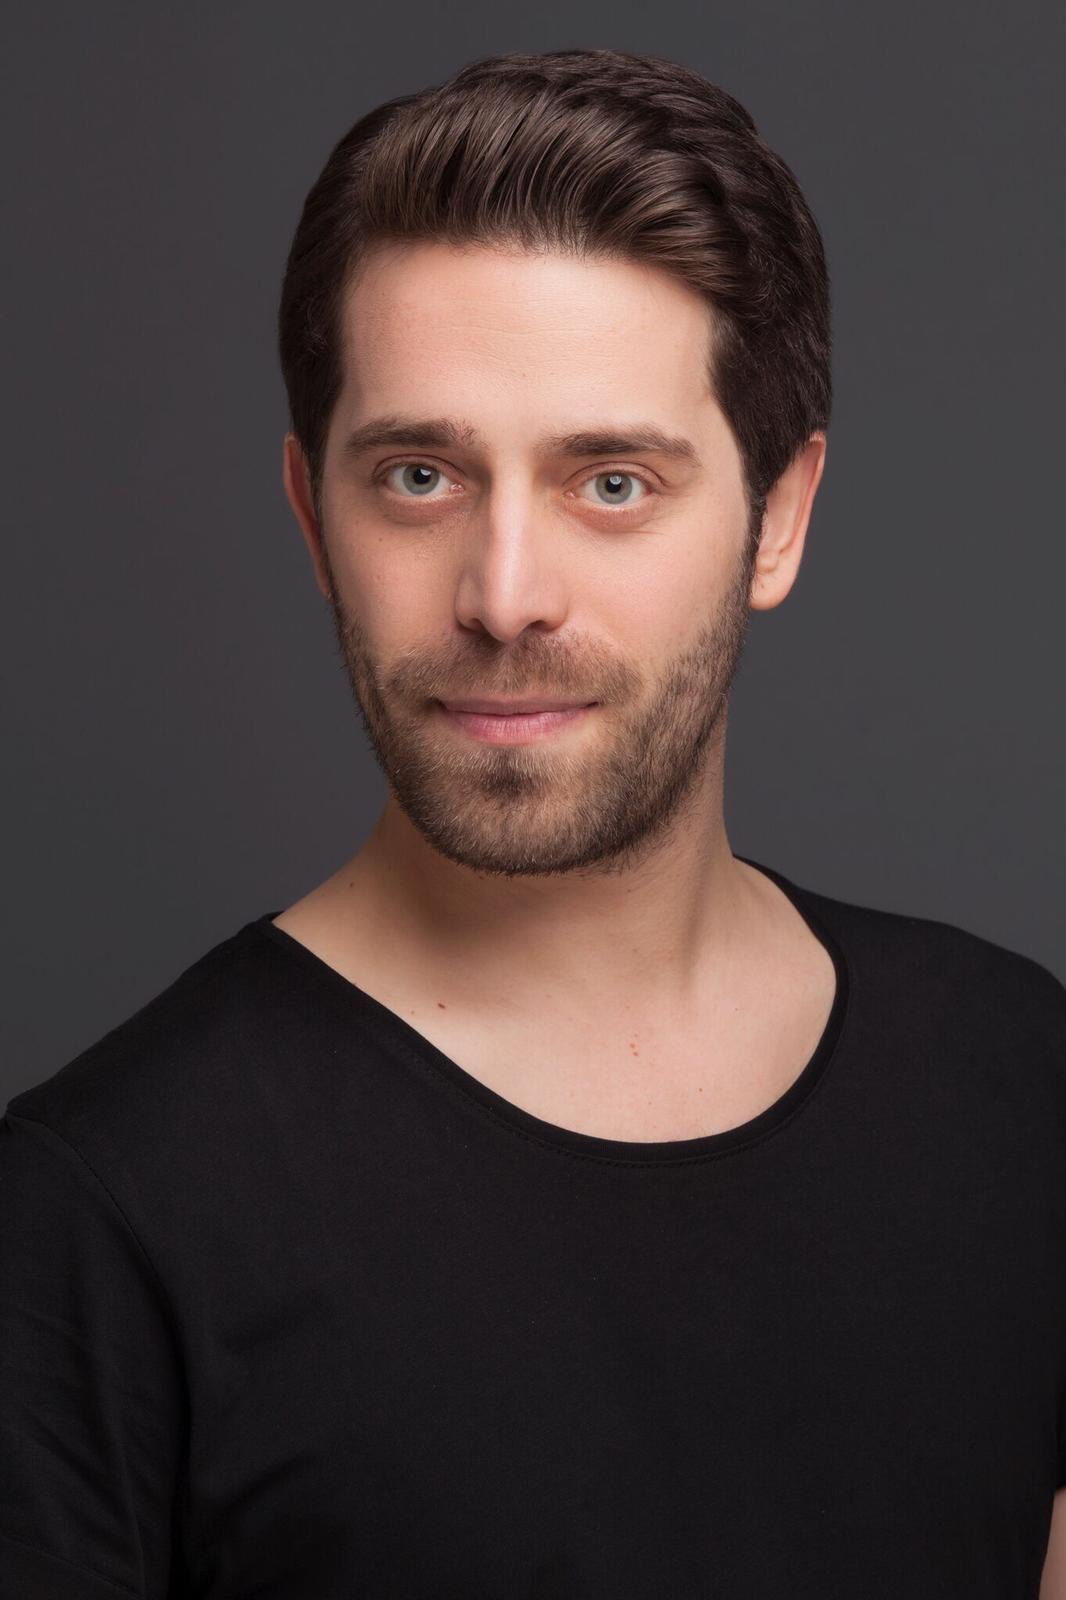 Murat Kapu - Profil Fotoğrafı